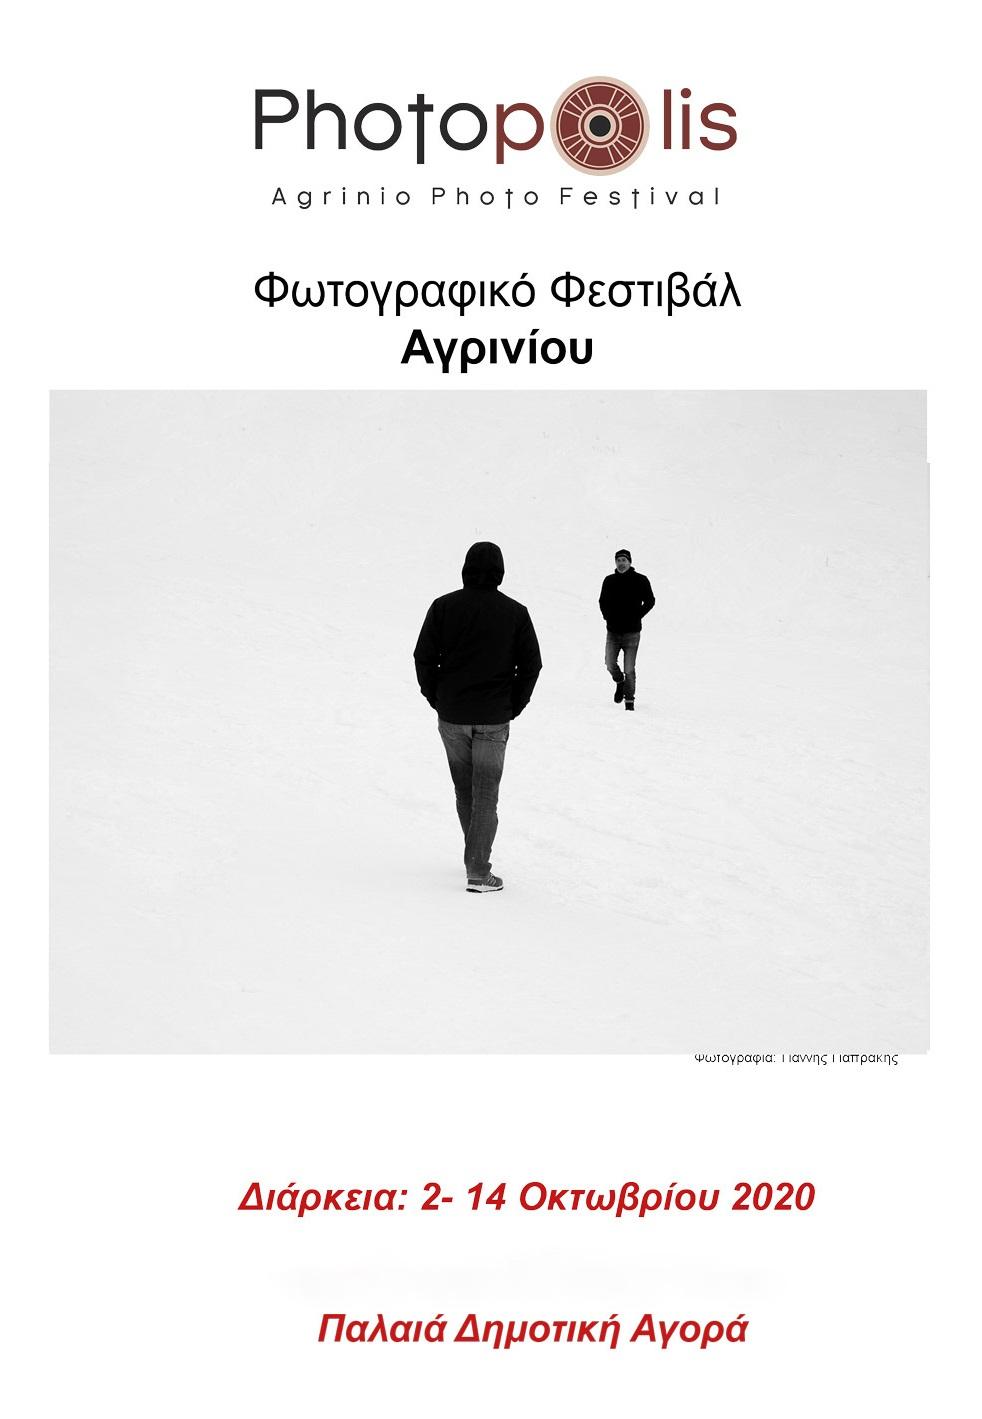 Photopolis:  ακυρώνονται οι παράπλευρες εκδηλώσεις του Φωτογραφικού φεστιβάλ Αγρινίου